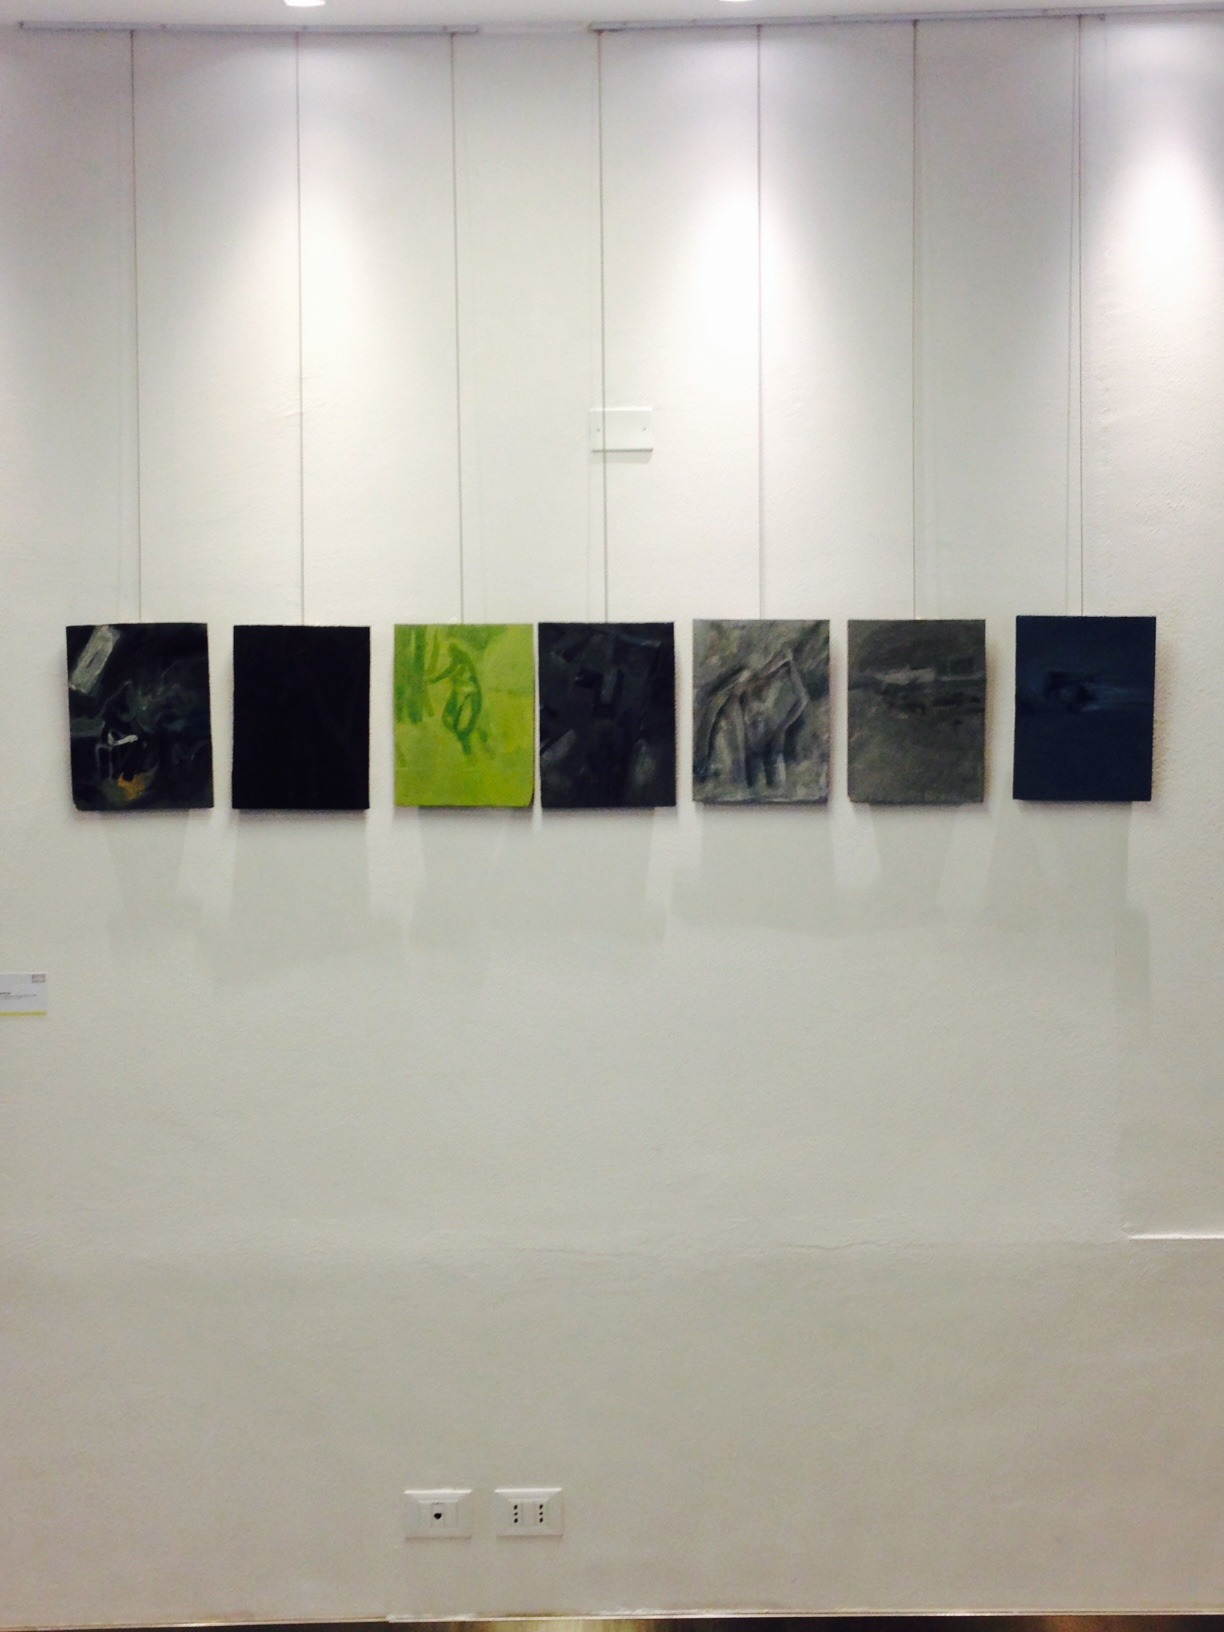 23.05.2015 Giuseppe Renda,allestimento galleria Duomo, Studi Aperti